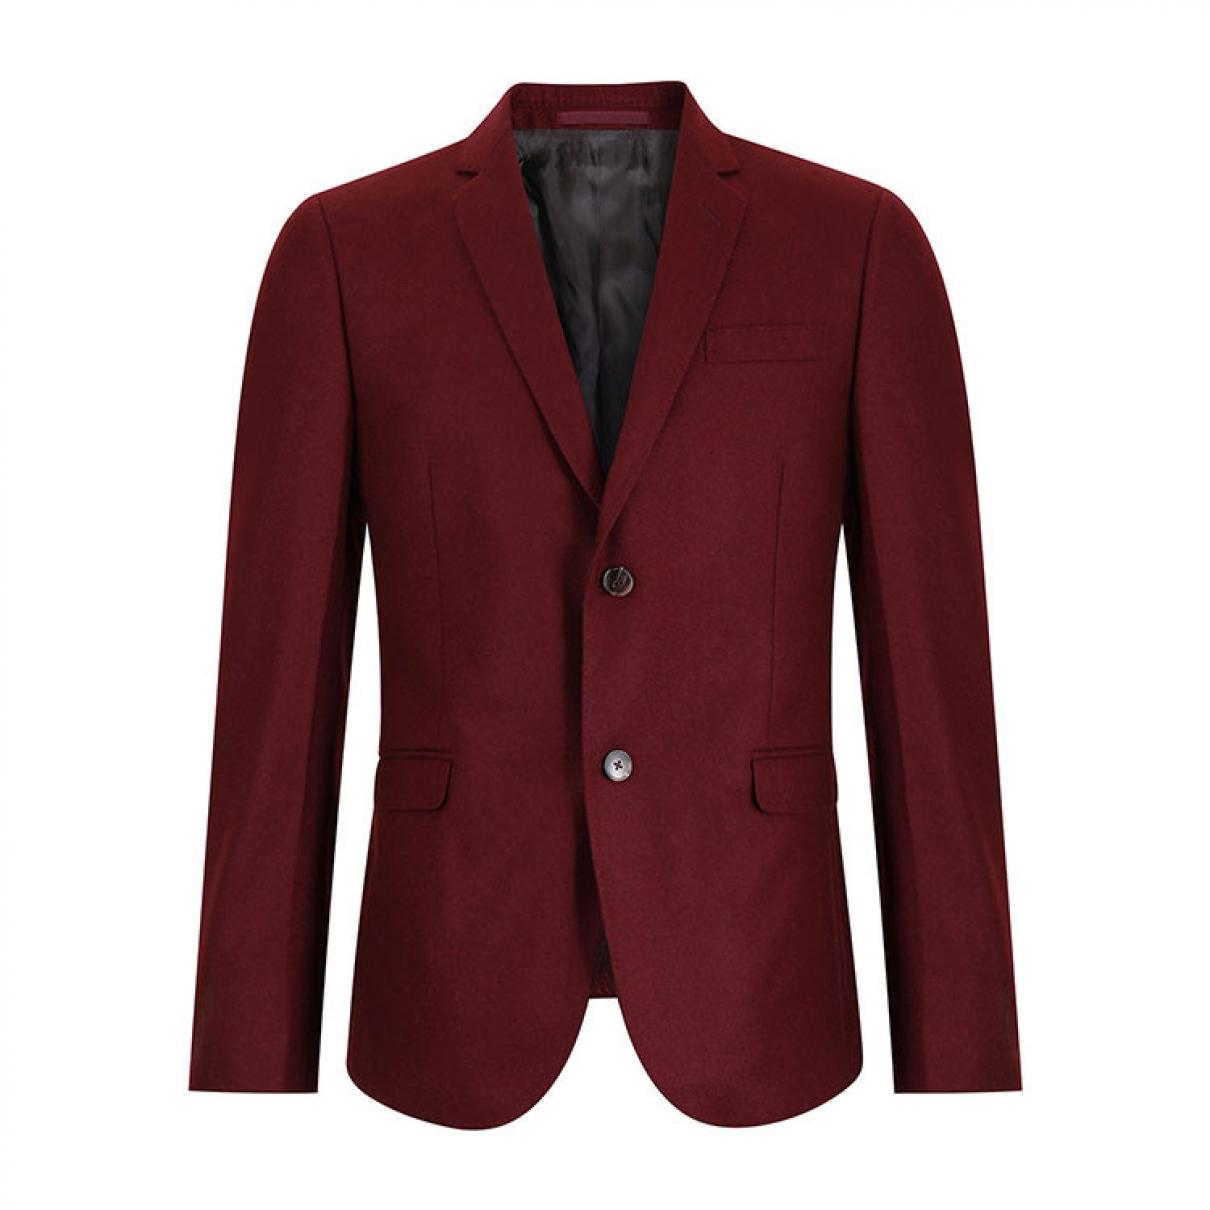 Gucci \N Burgundy Cashmere jacket  for Men 46 IT